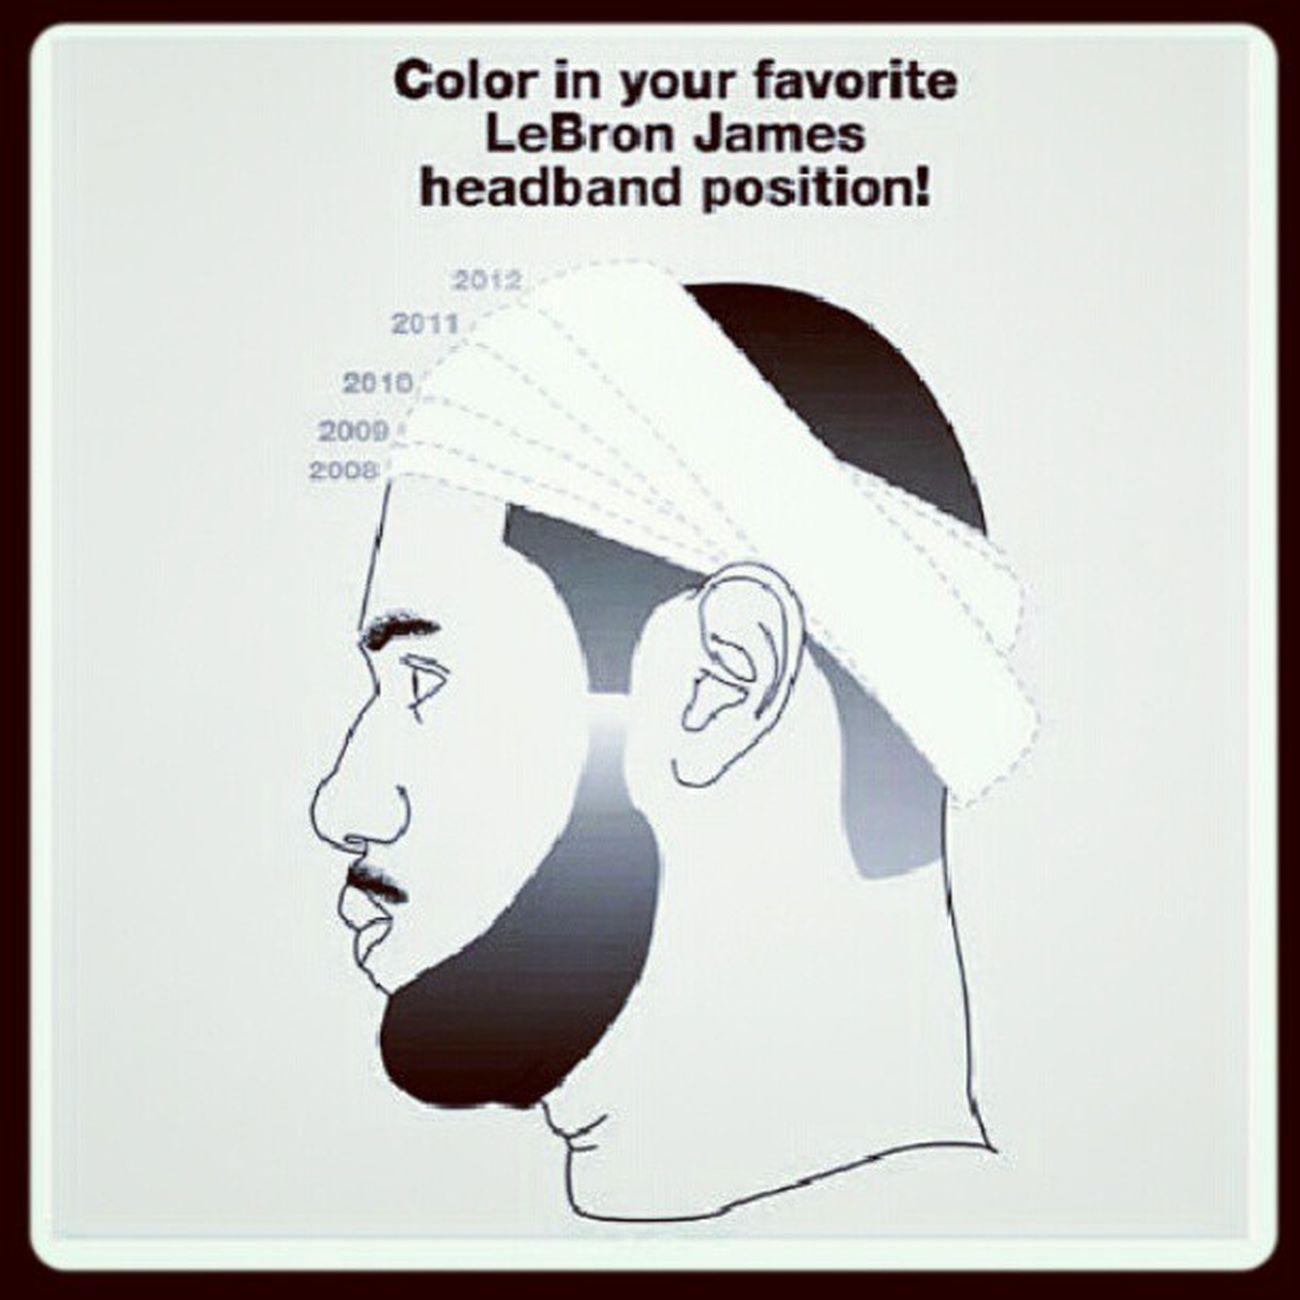 LeBron is going bald y'all. Lebronjames Hairline Balding Jokesneverend